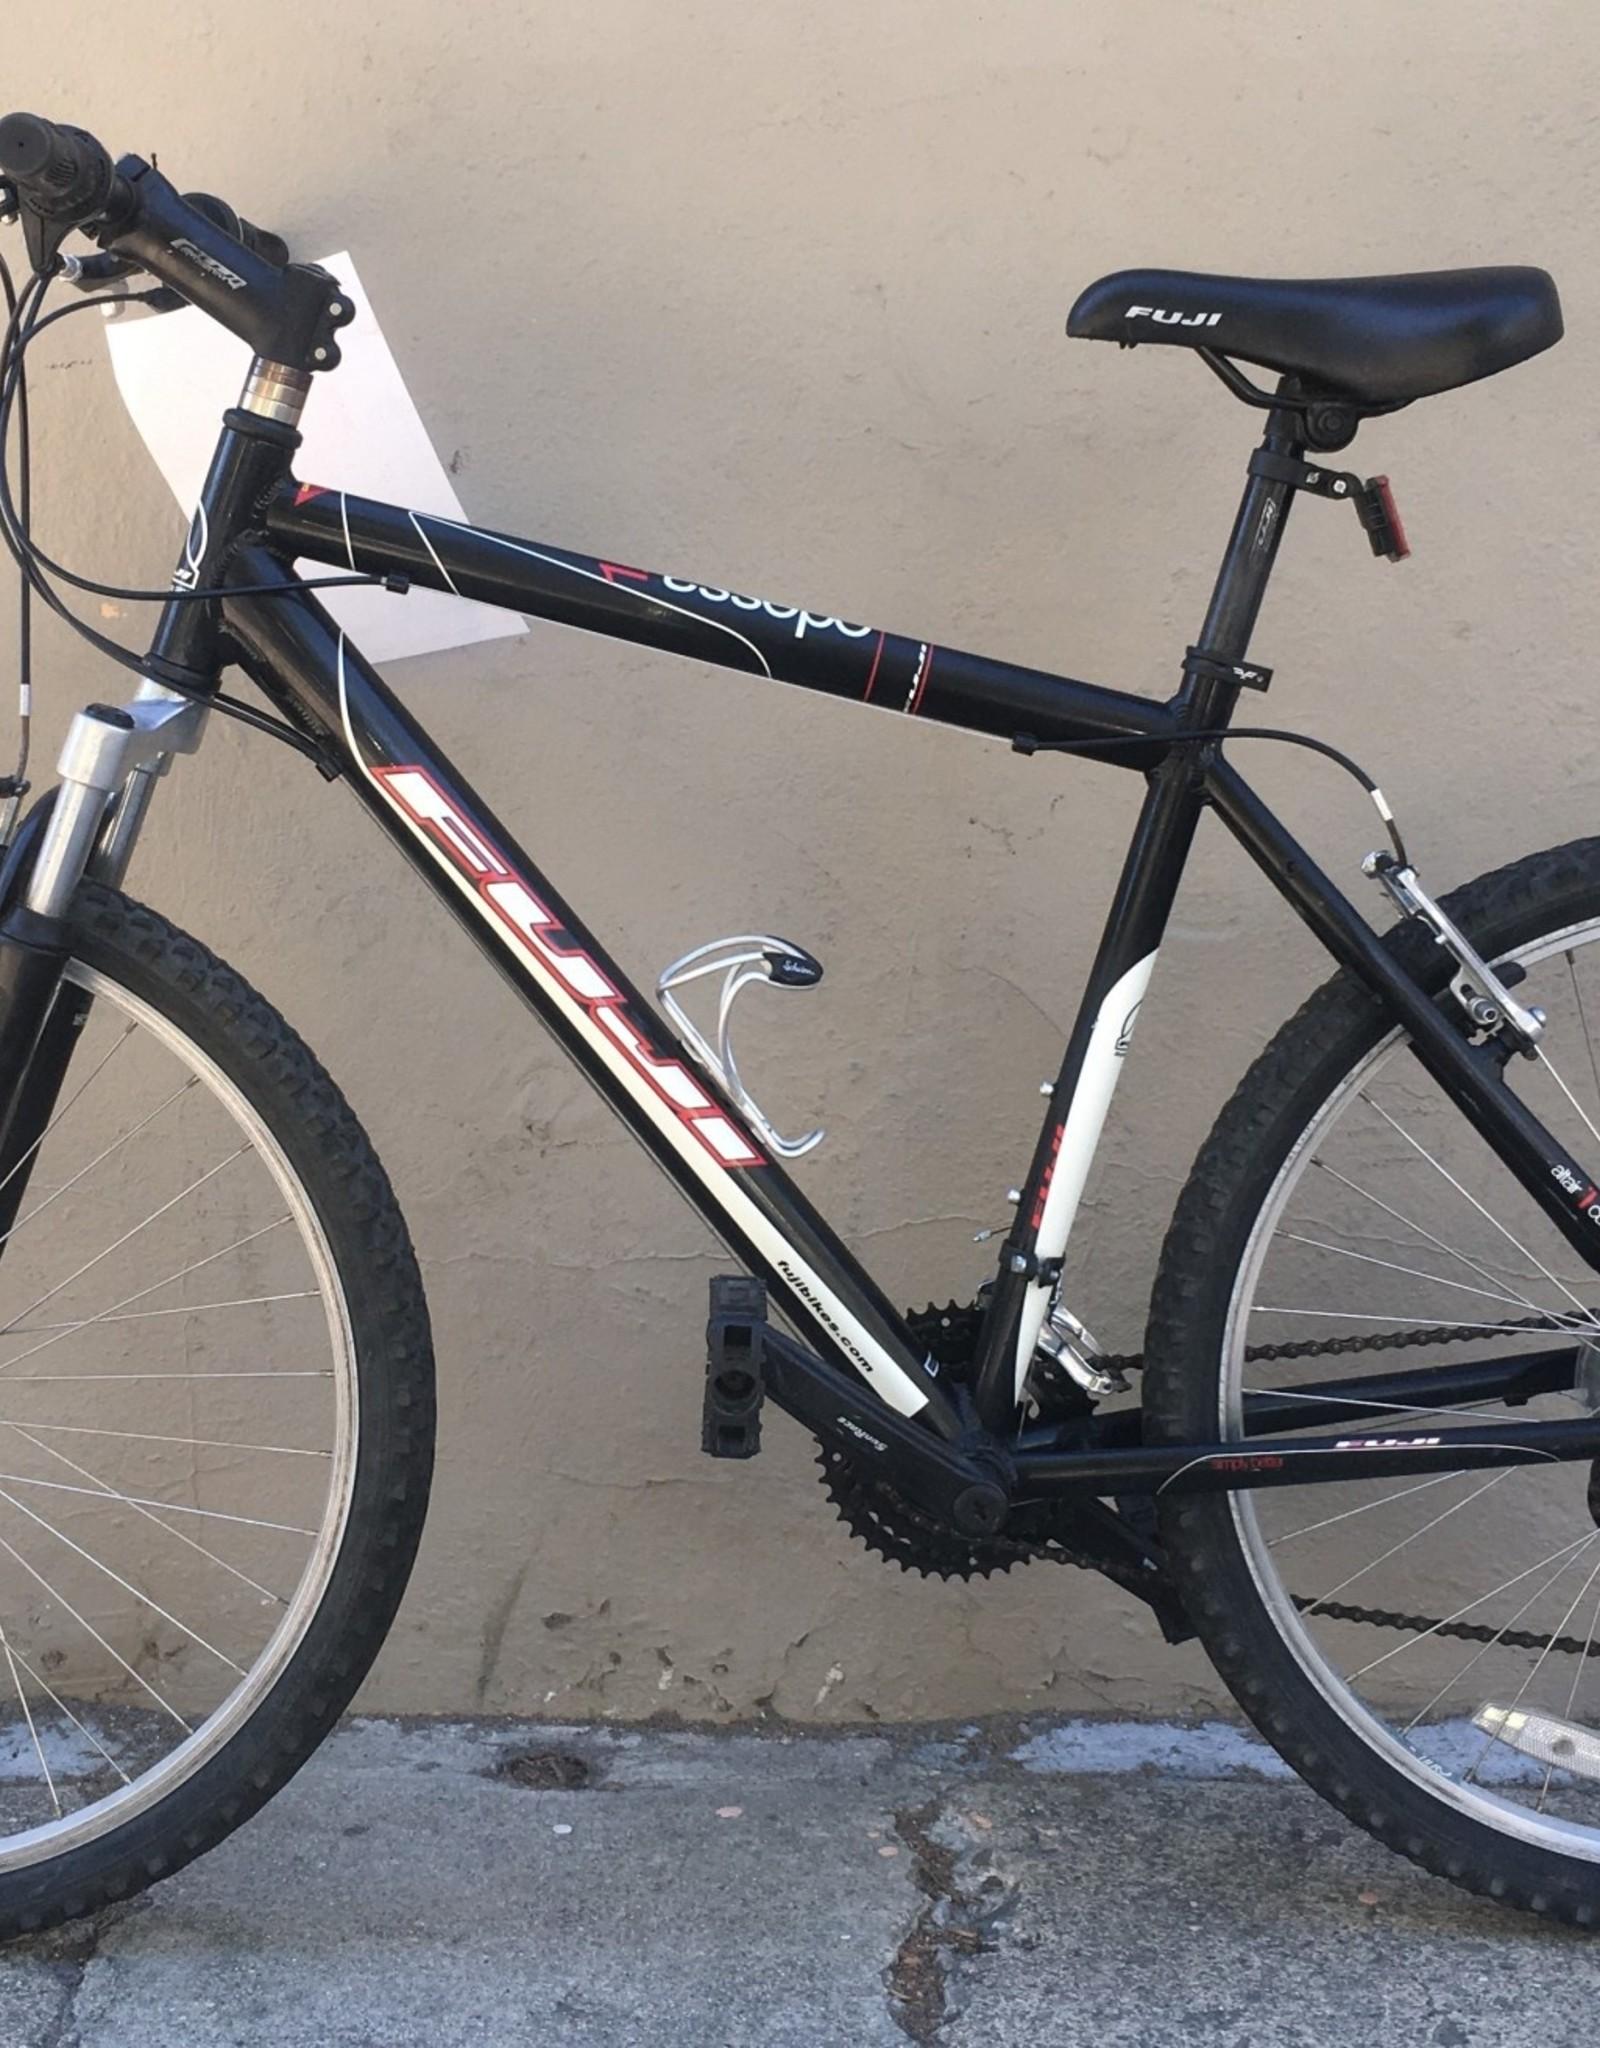 Fuji Fuji Odessa 1.0 Hybrid, Black, 19 Inches, 2009